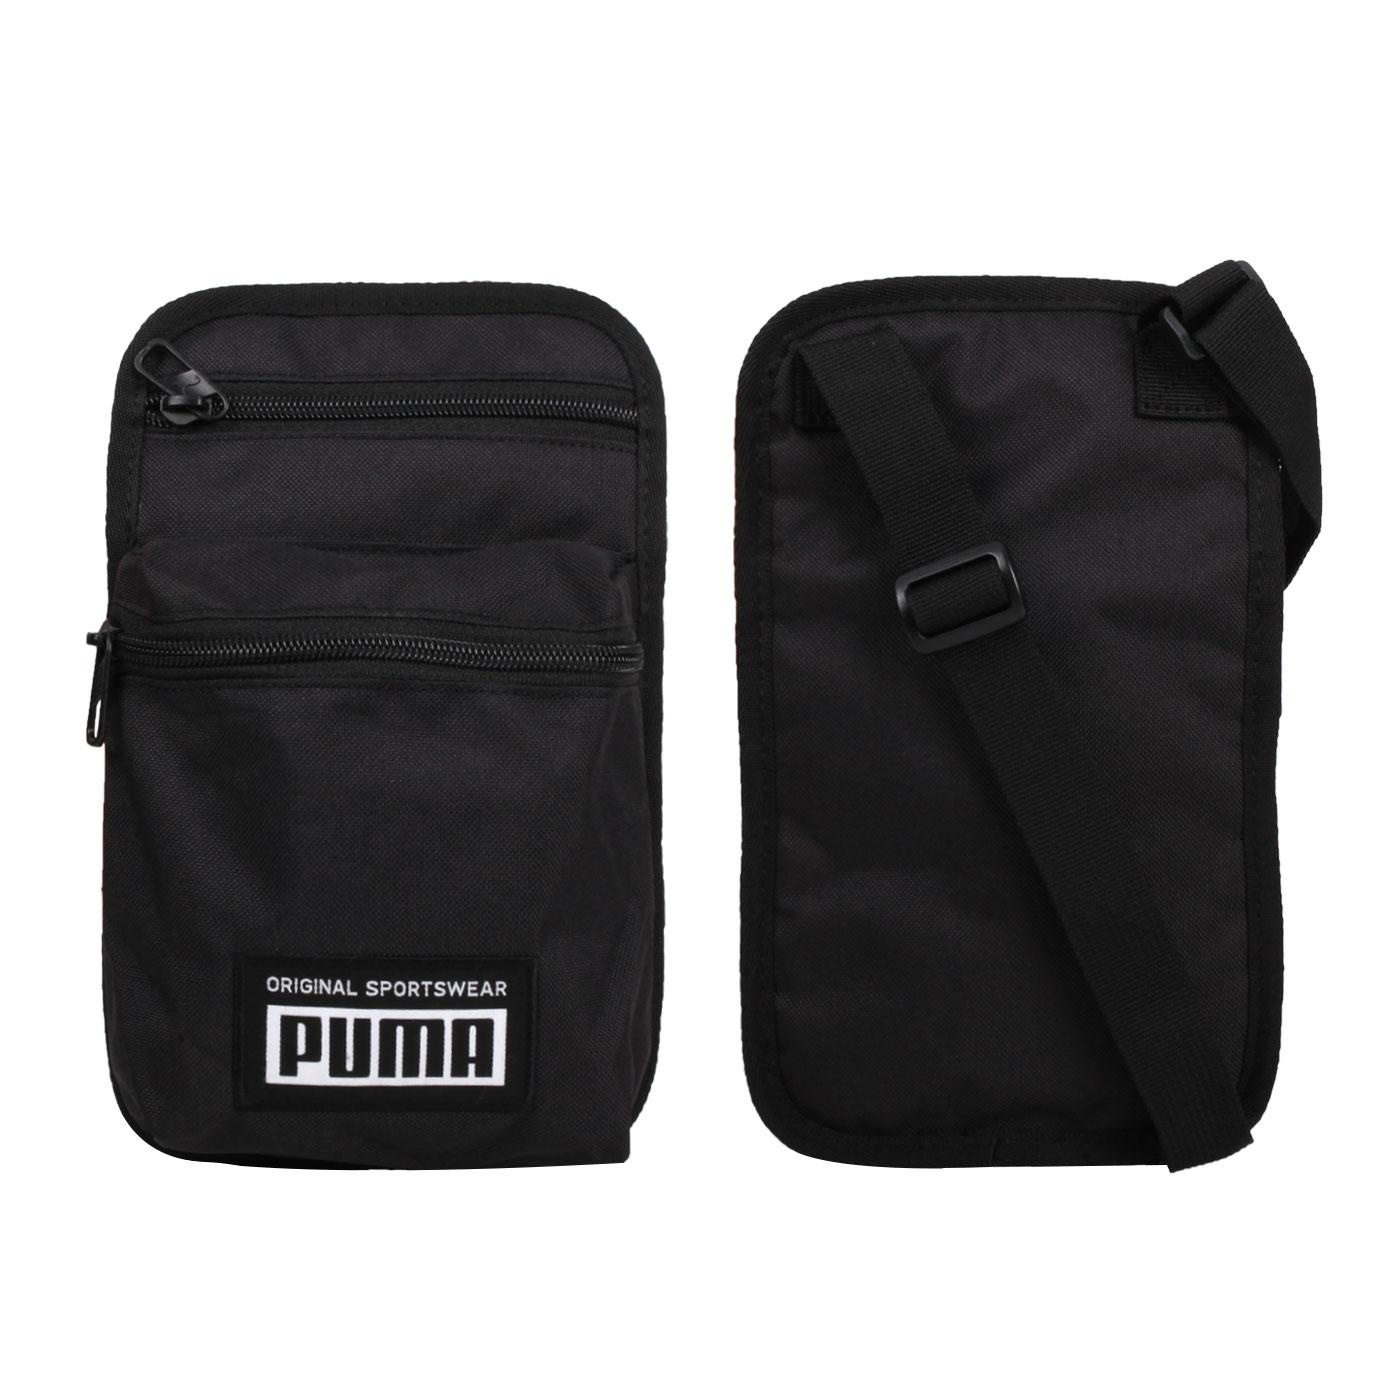 PUMA 側背小包 07730401 - 黑白